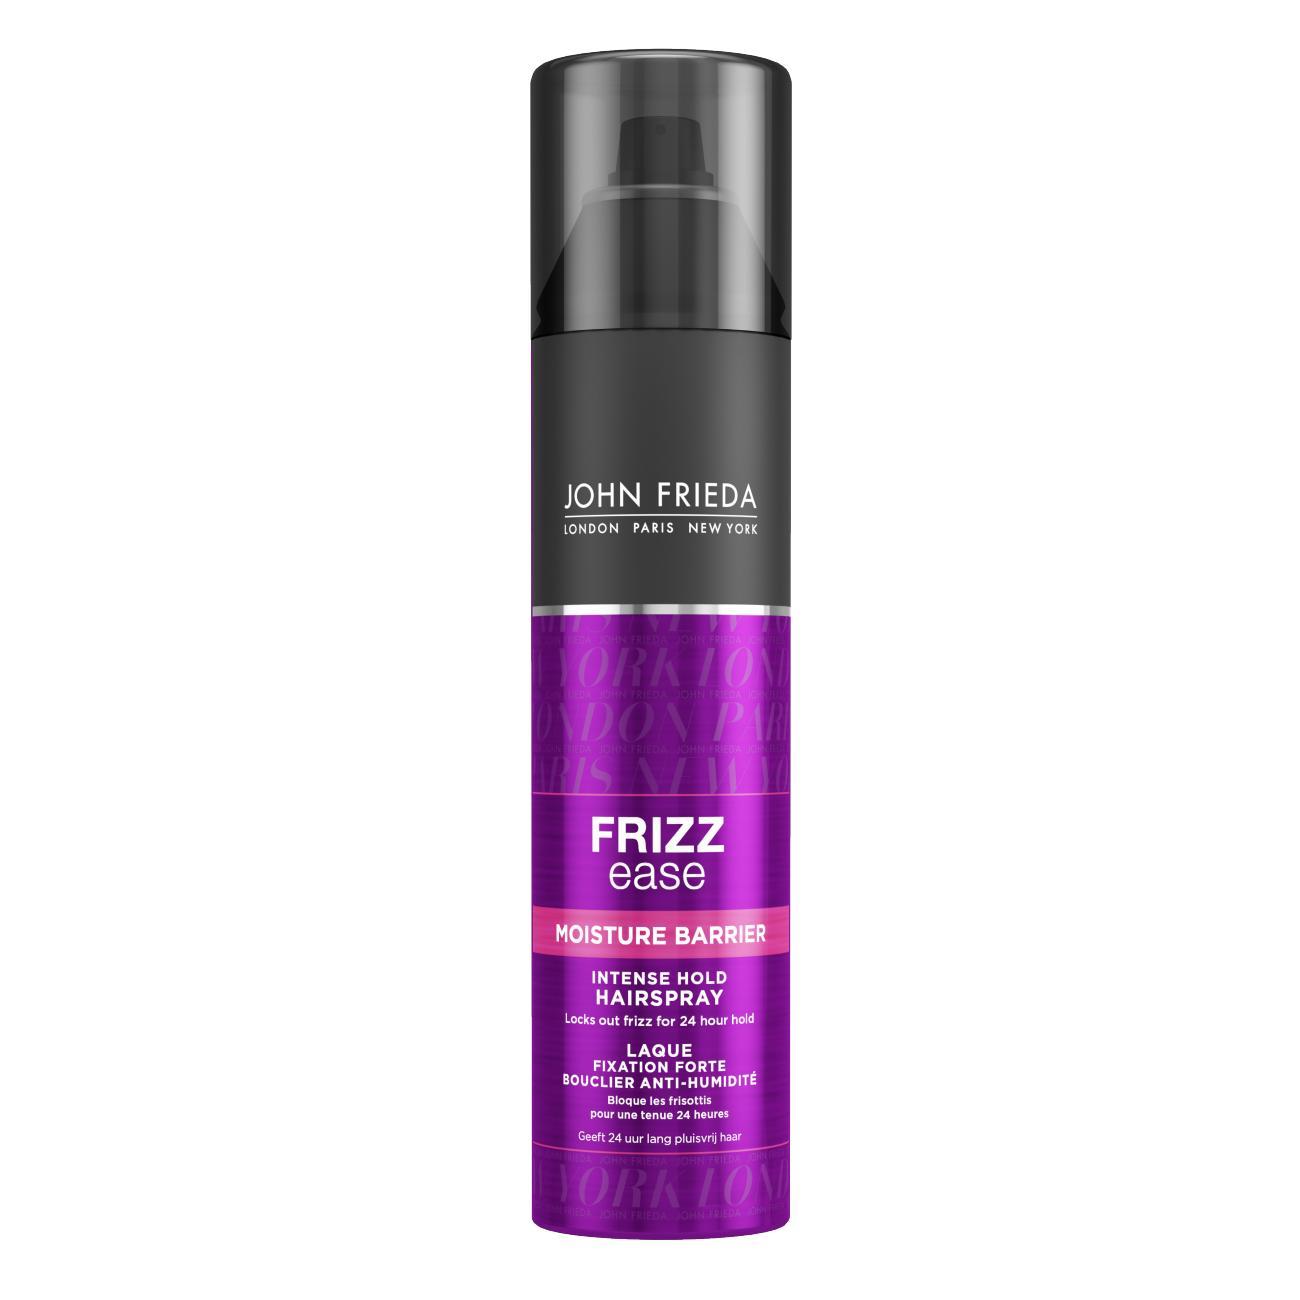 ��� ��� ����� John Frieda Frizz Ease ������������ ������� 250 ��